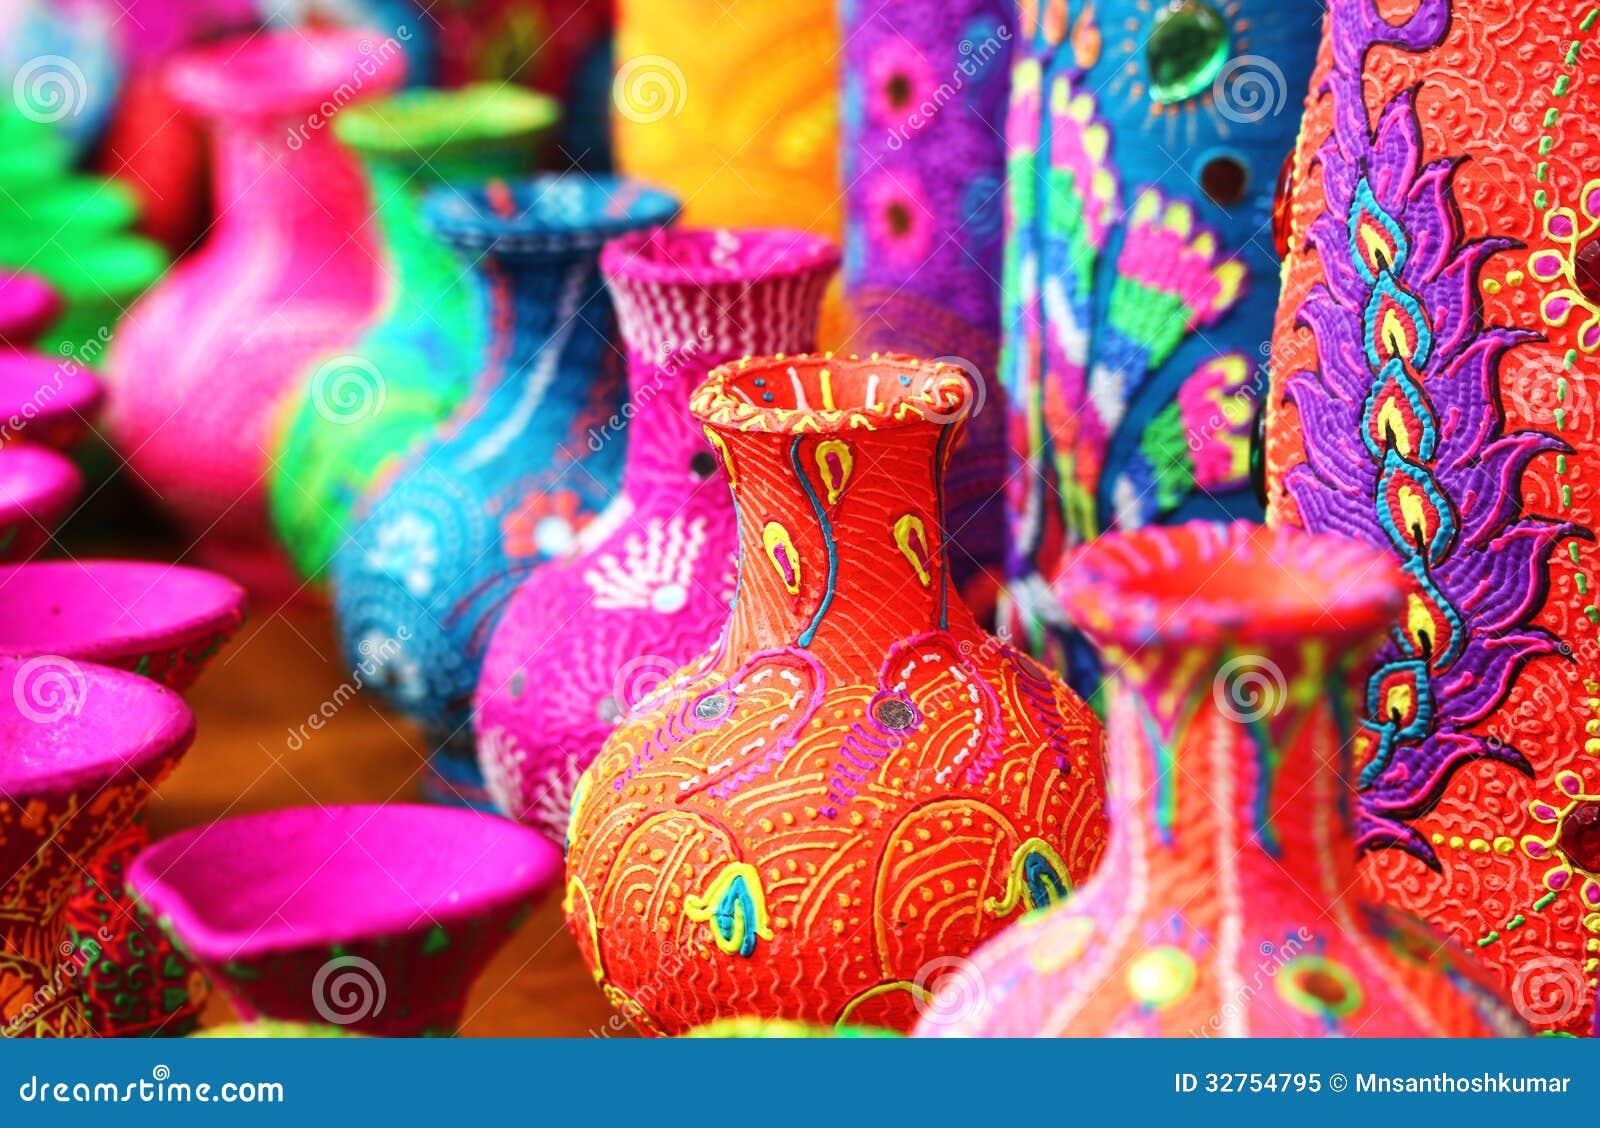 Potenciômetros ou vasos de flor artísticos coloridos em cores vibrantes